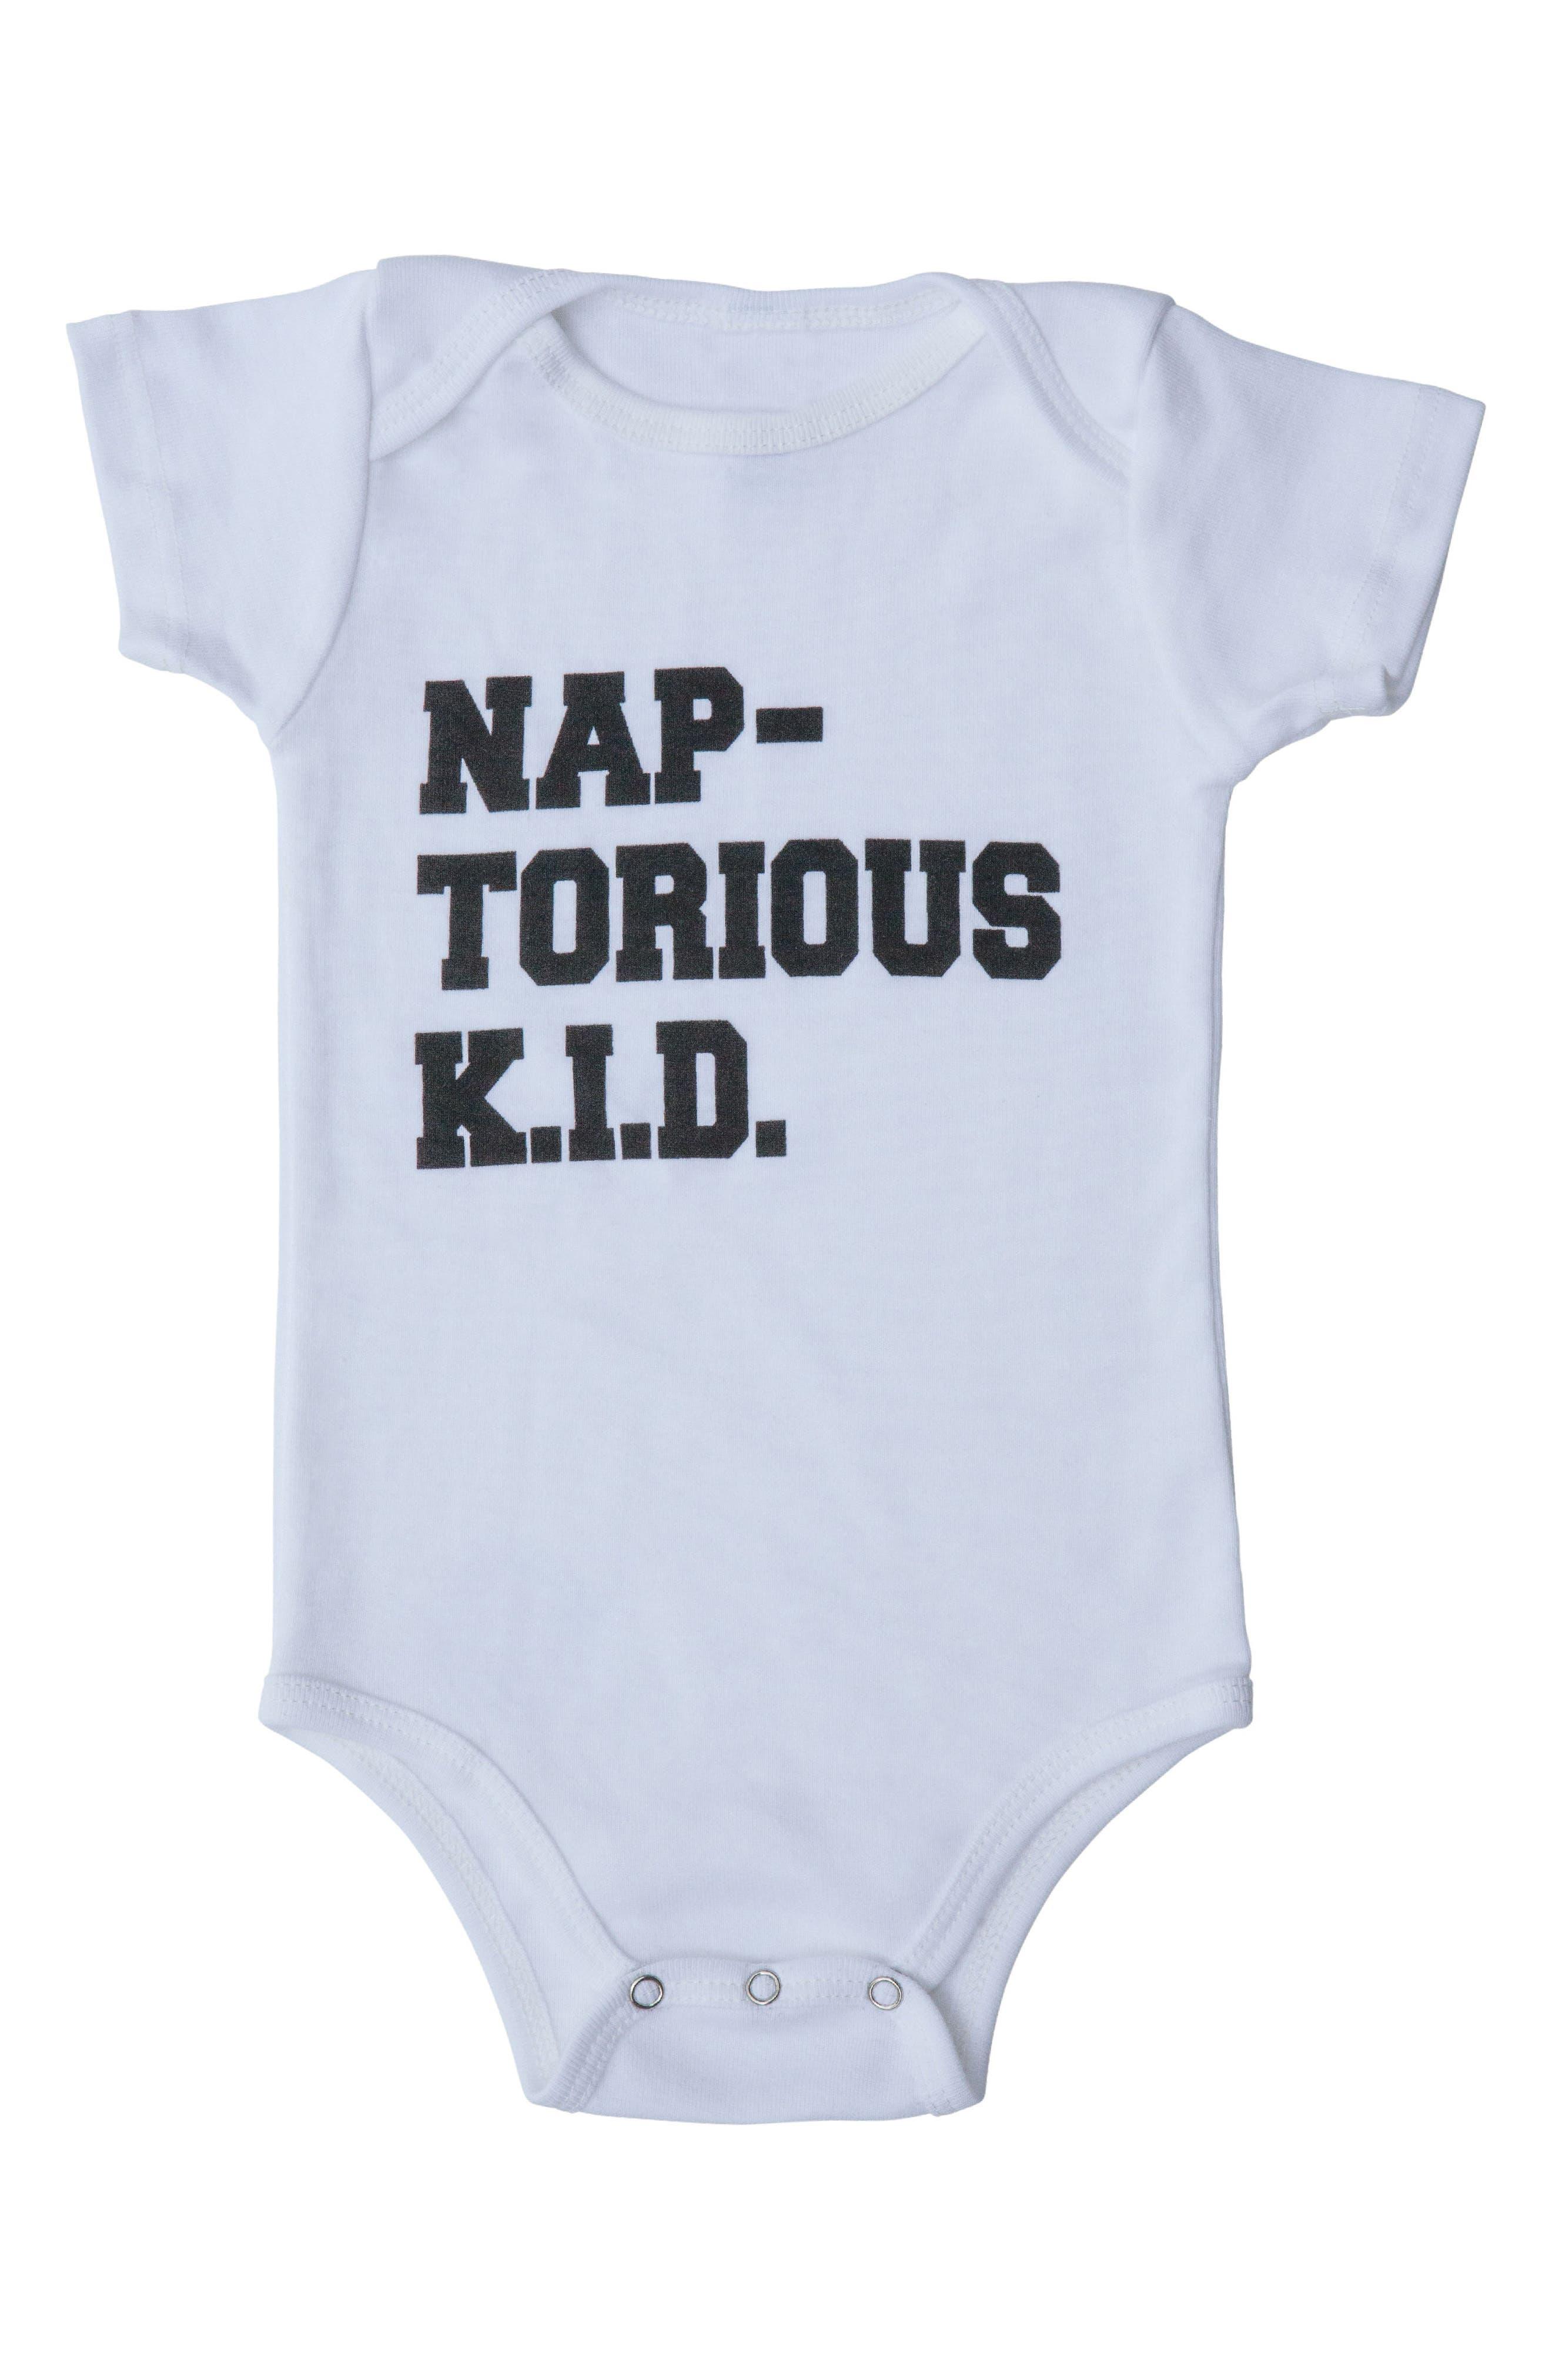 Main Image - Perfectly Baked Naptorious K.I.D. Bodysuit (Baby)